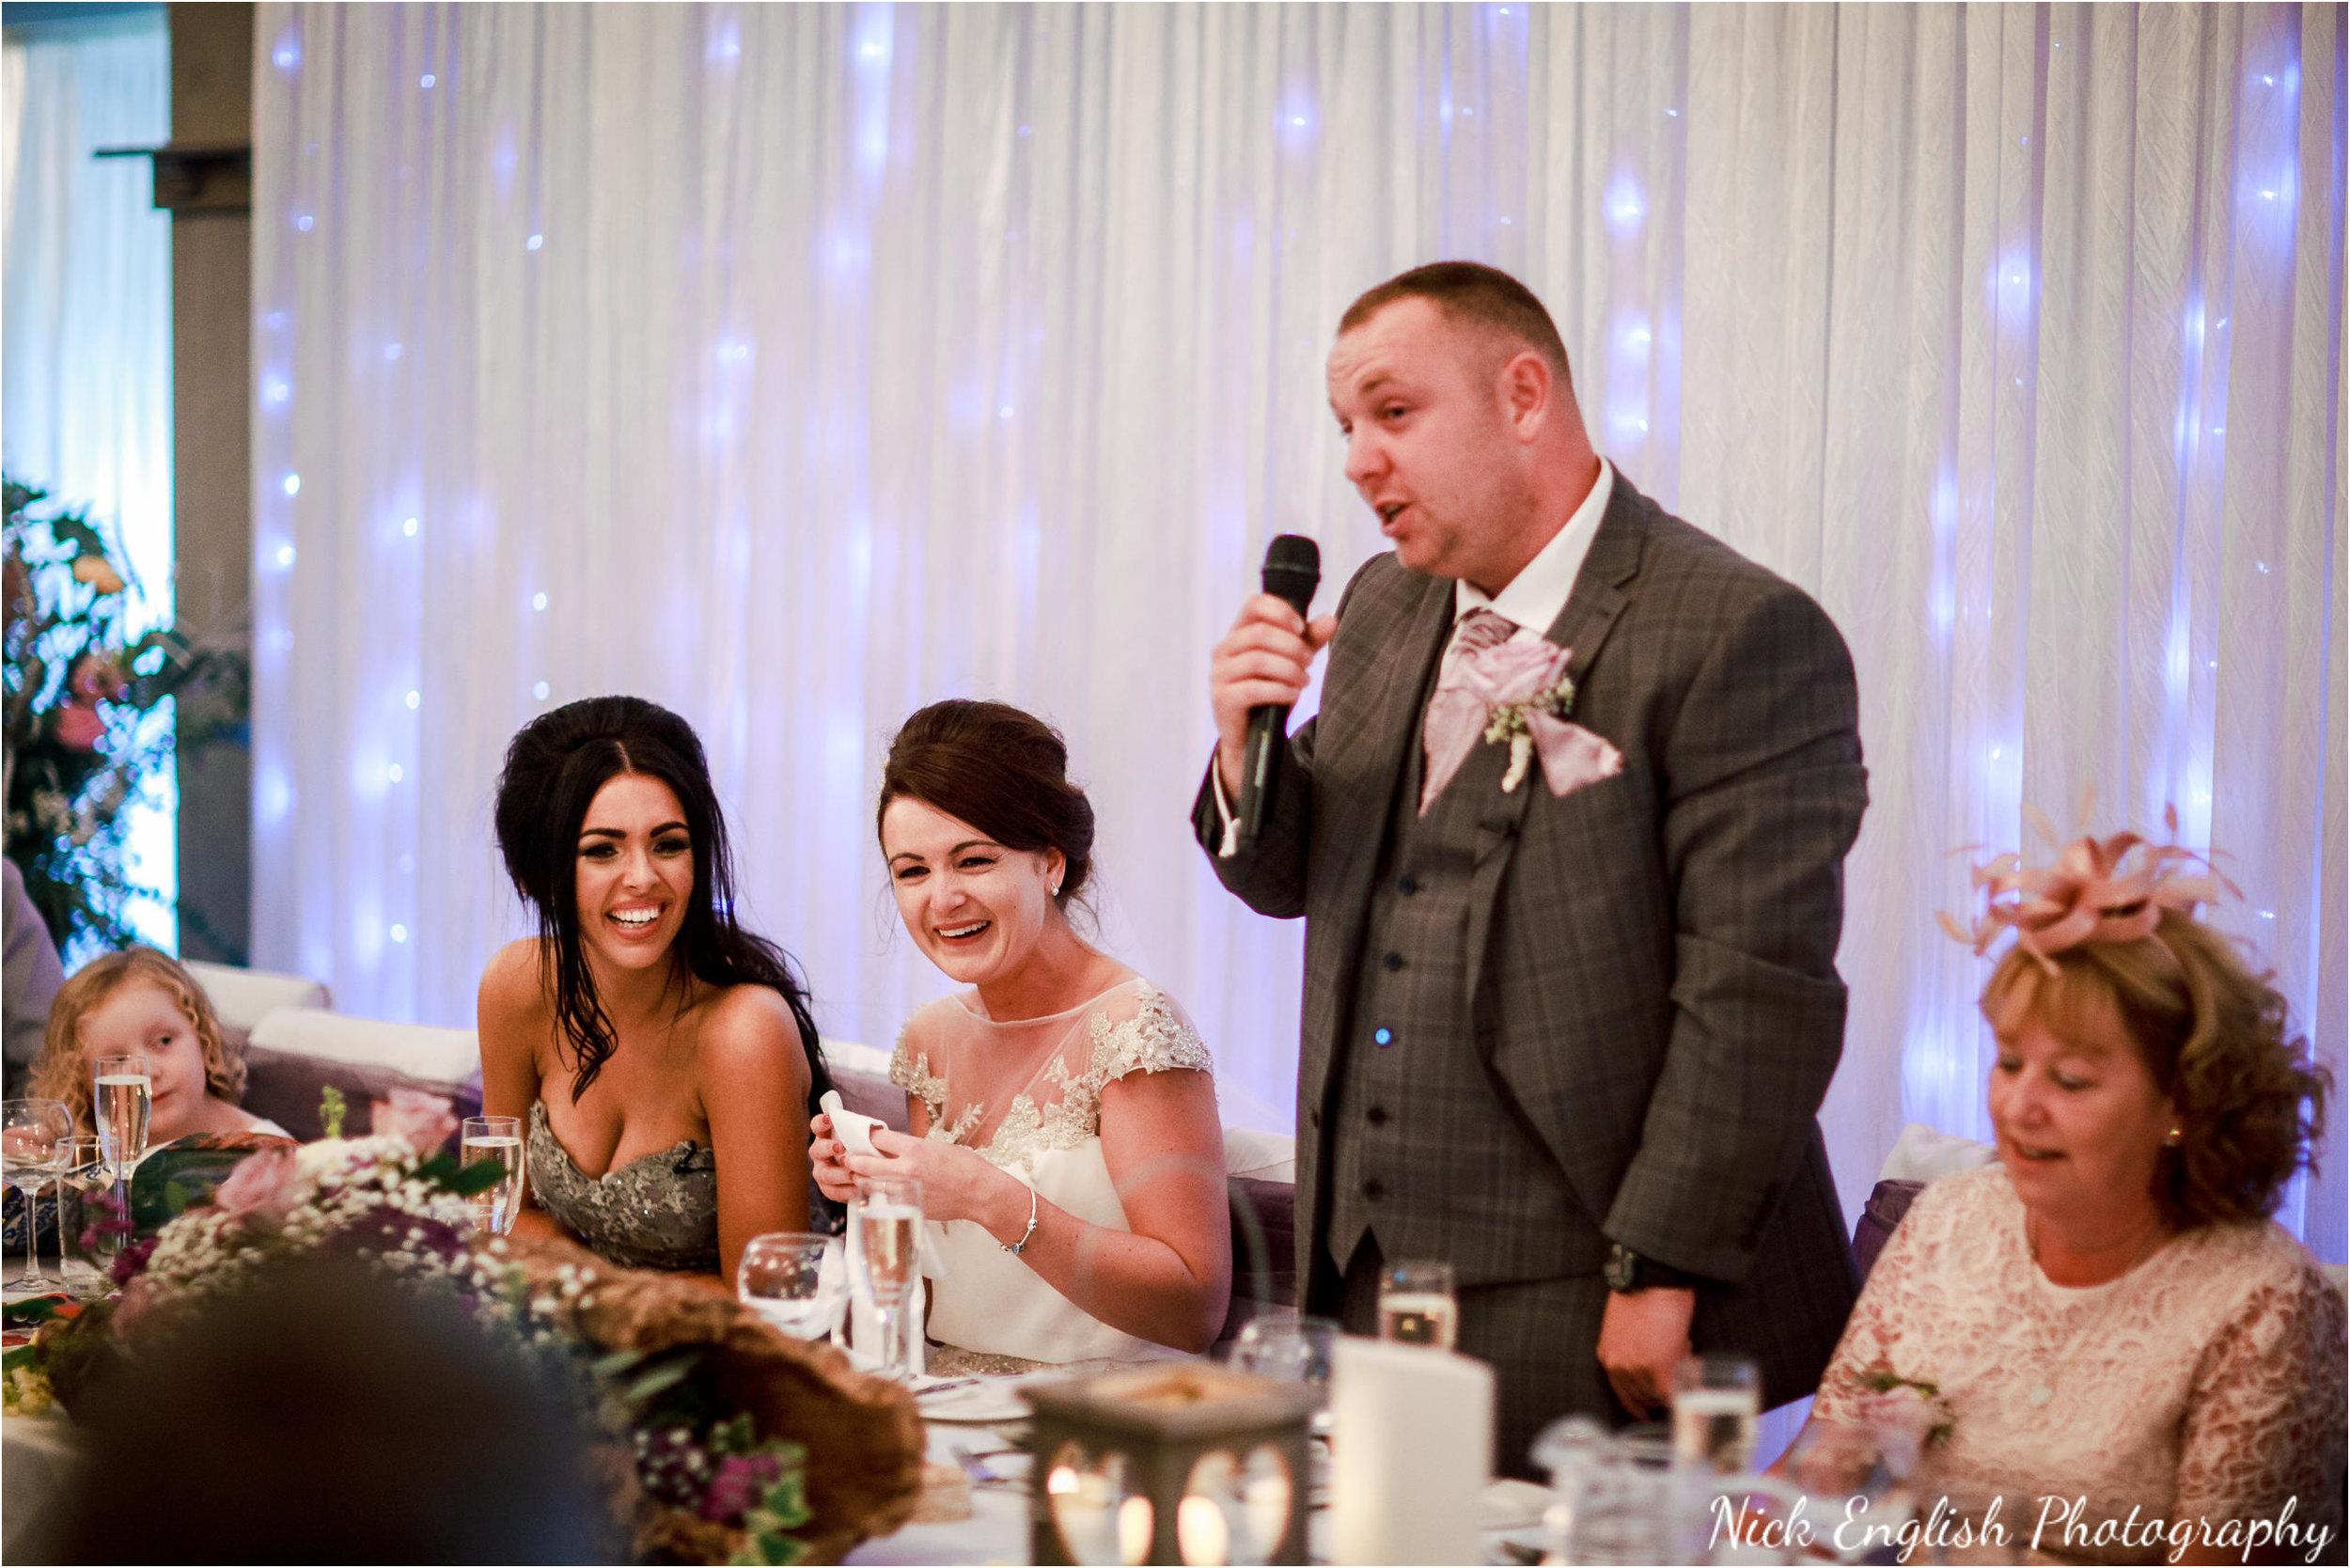 Stacey-Ash-Wedding-Photographs-Stanley-House-Preston-Lancashire-163.jpg